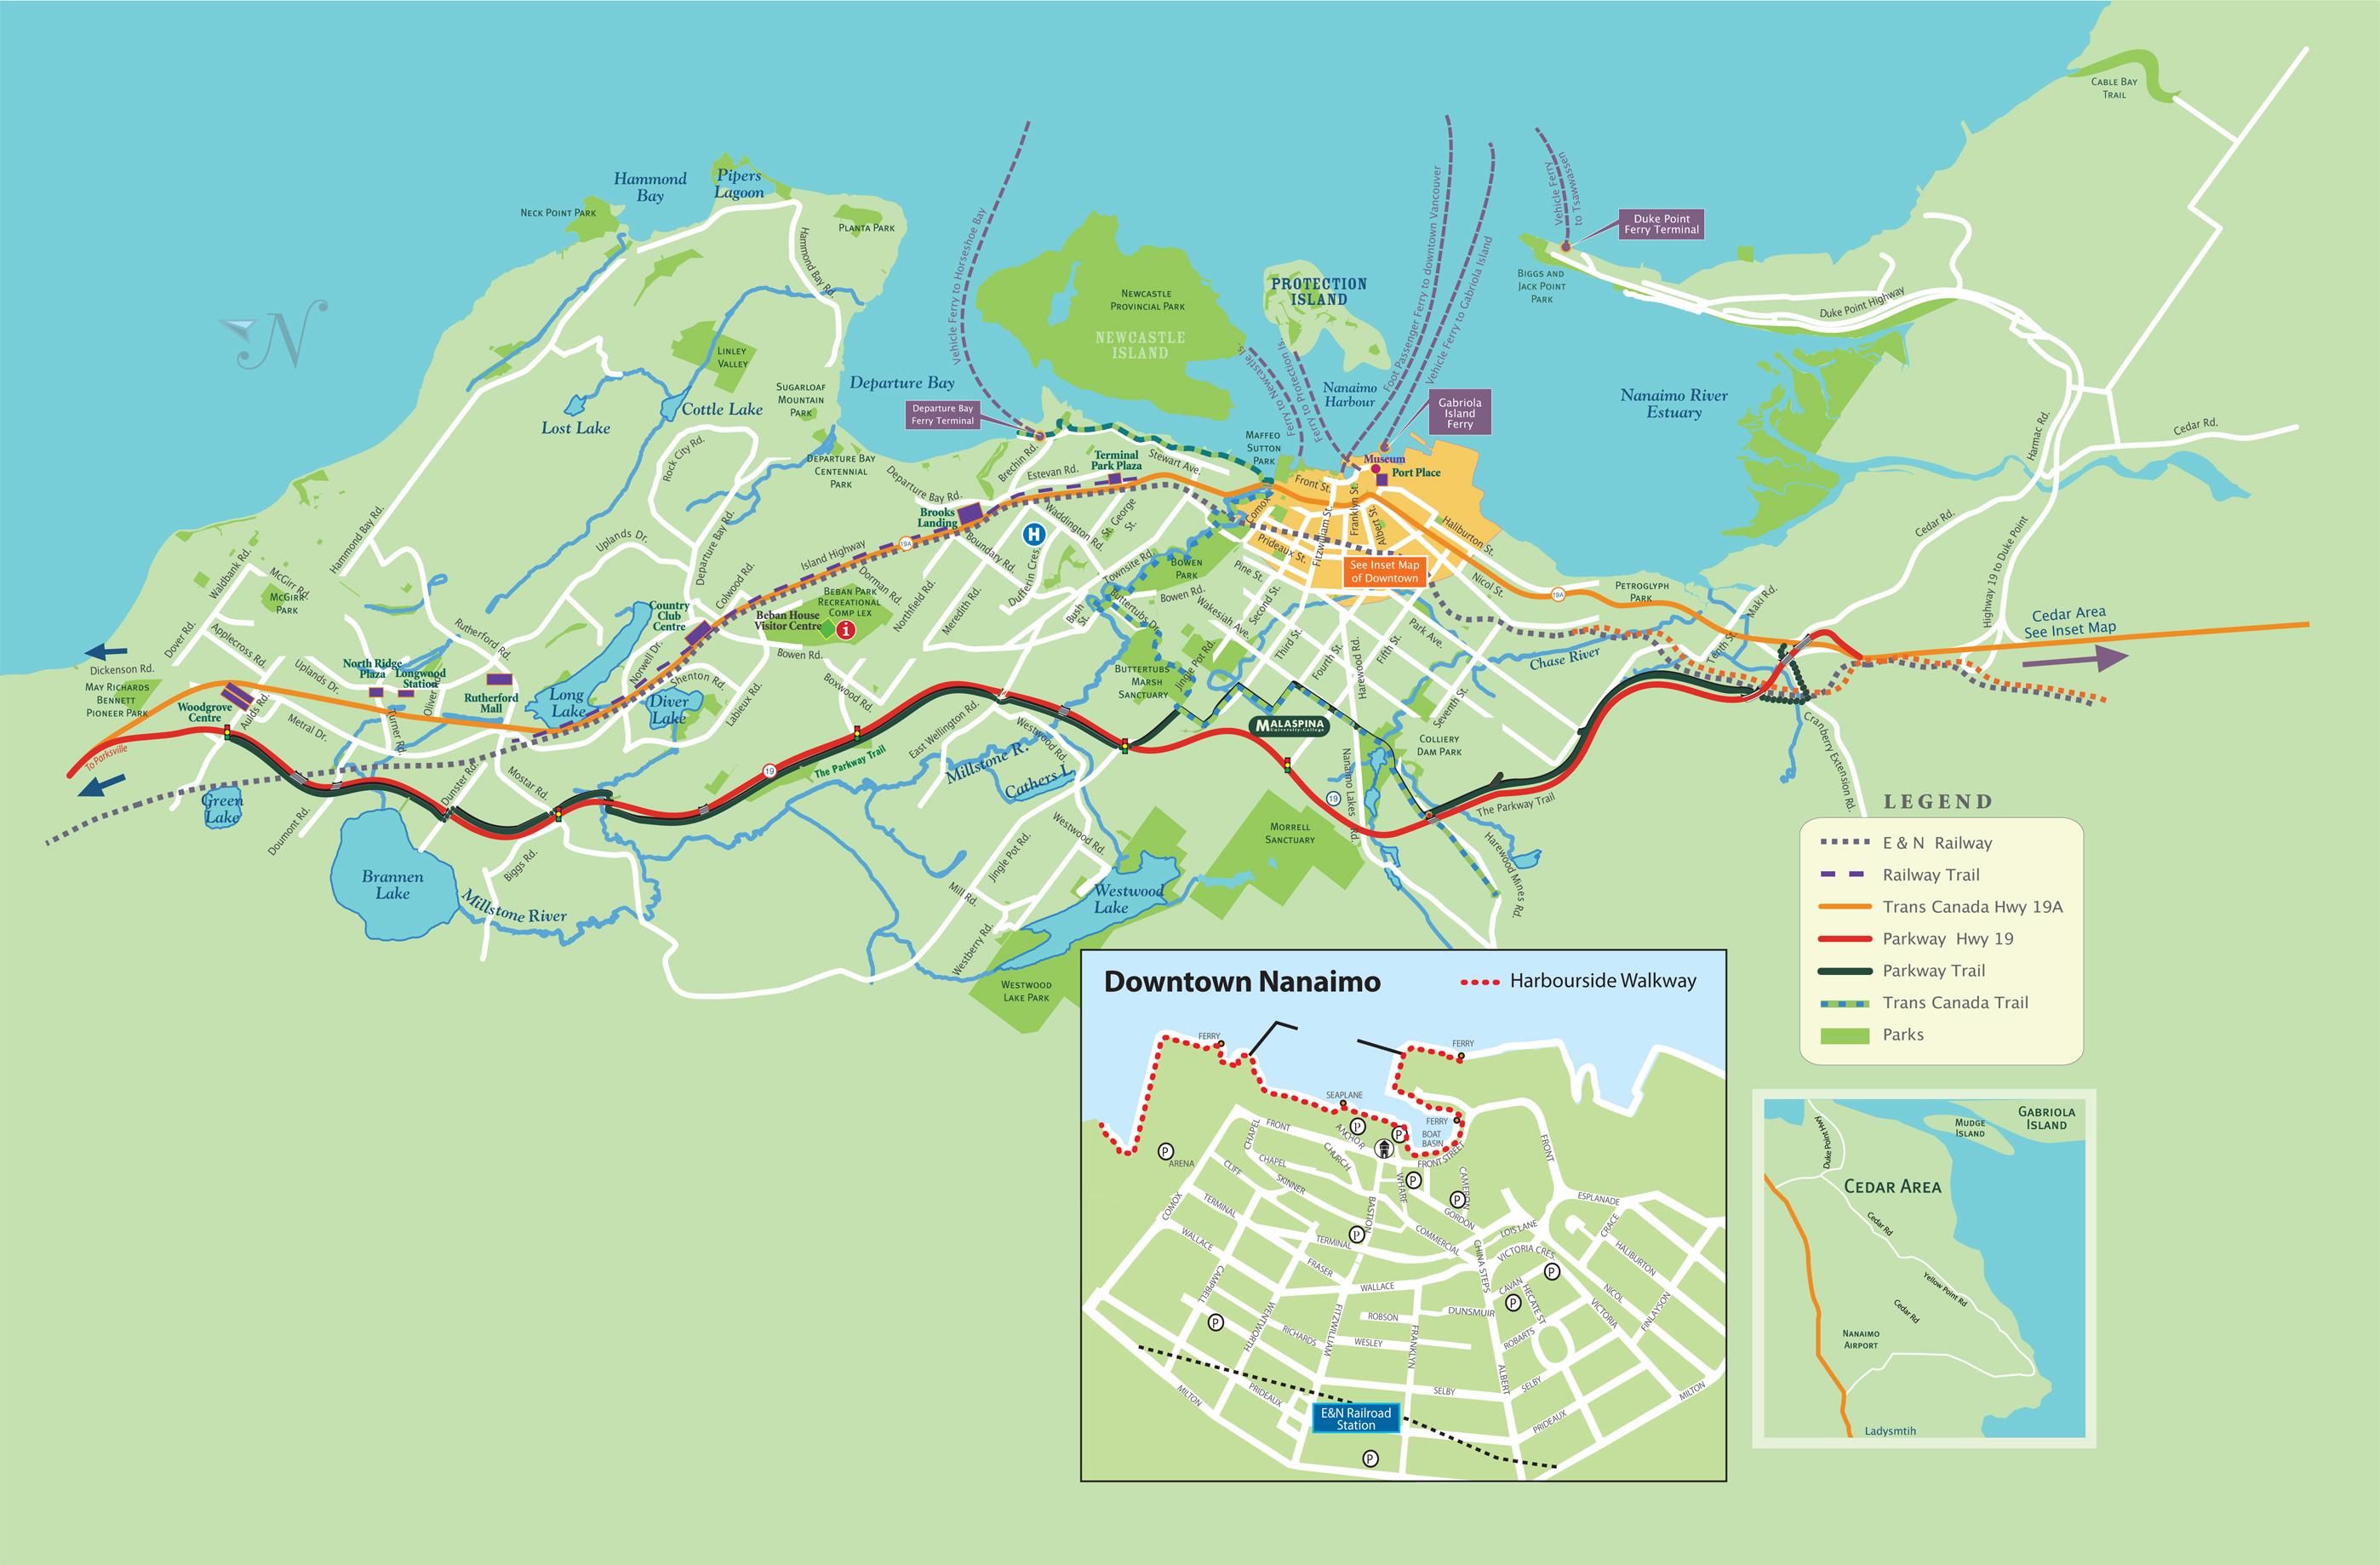 City Of Nanaimo Map Nanaimo City Map   Map Pictures City Of Nanaimo Map